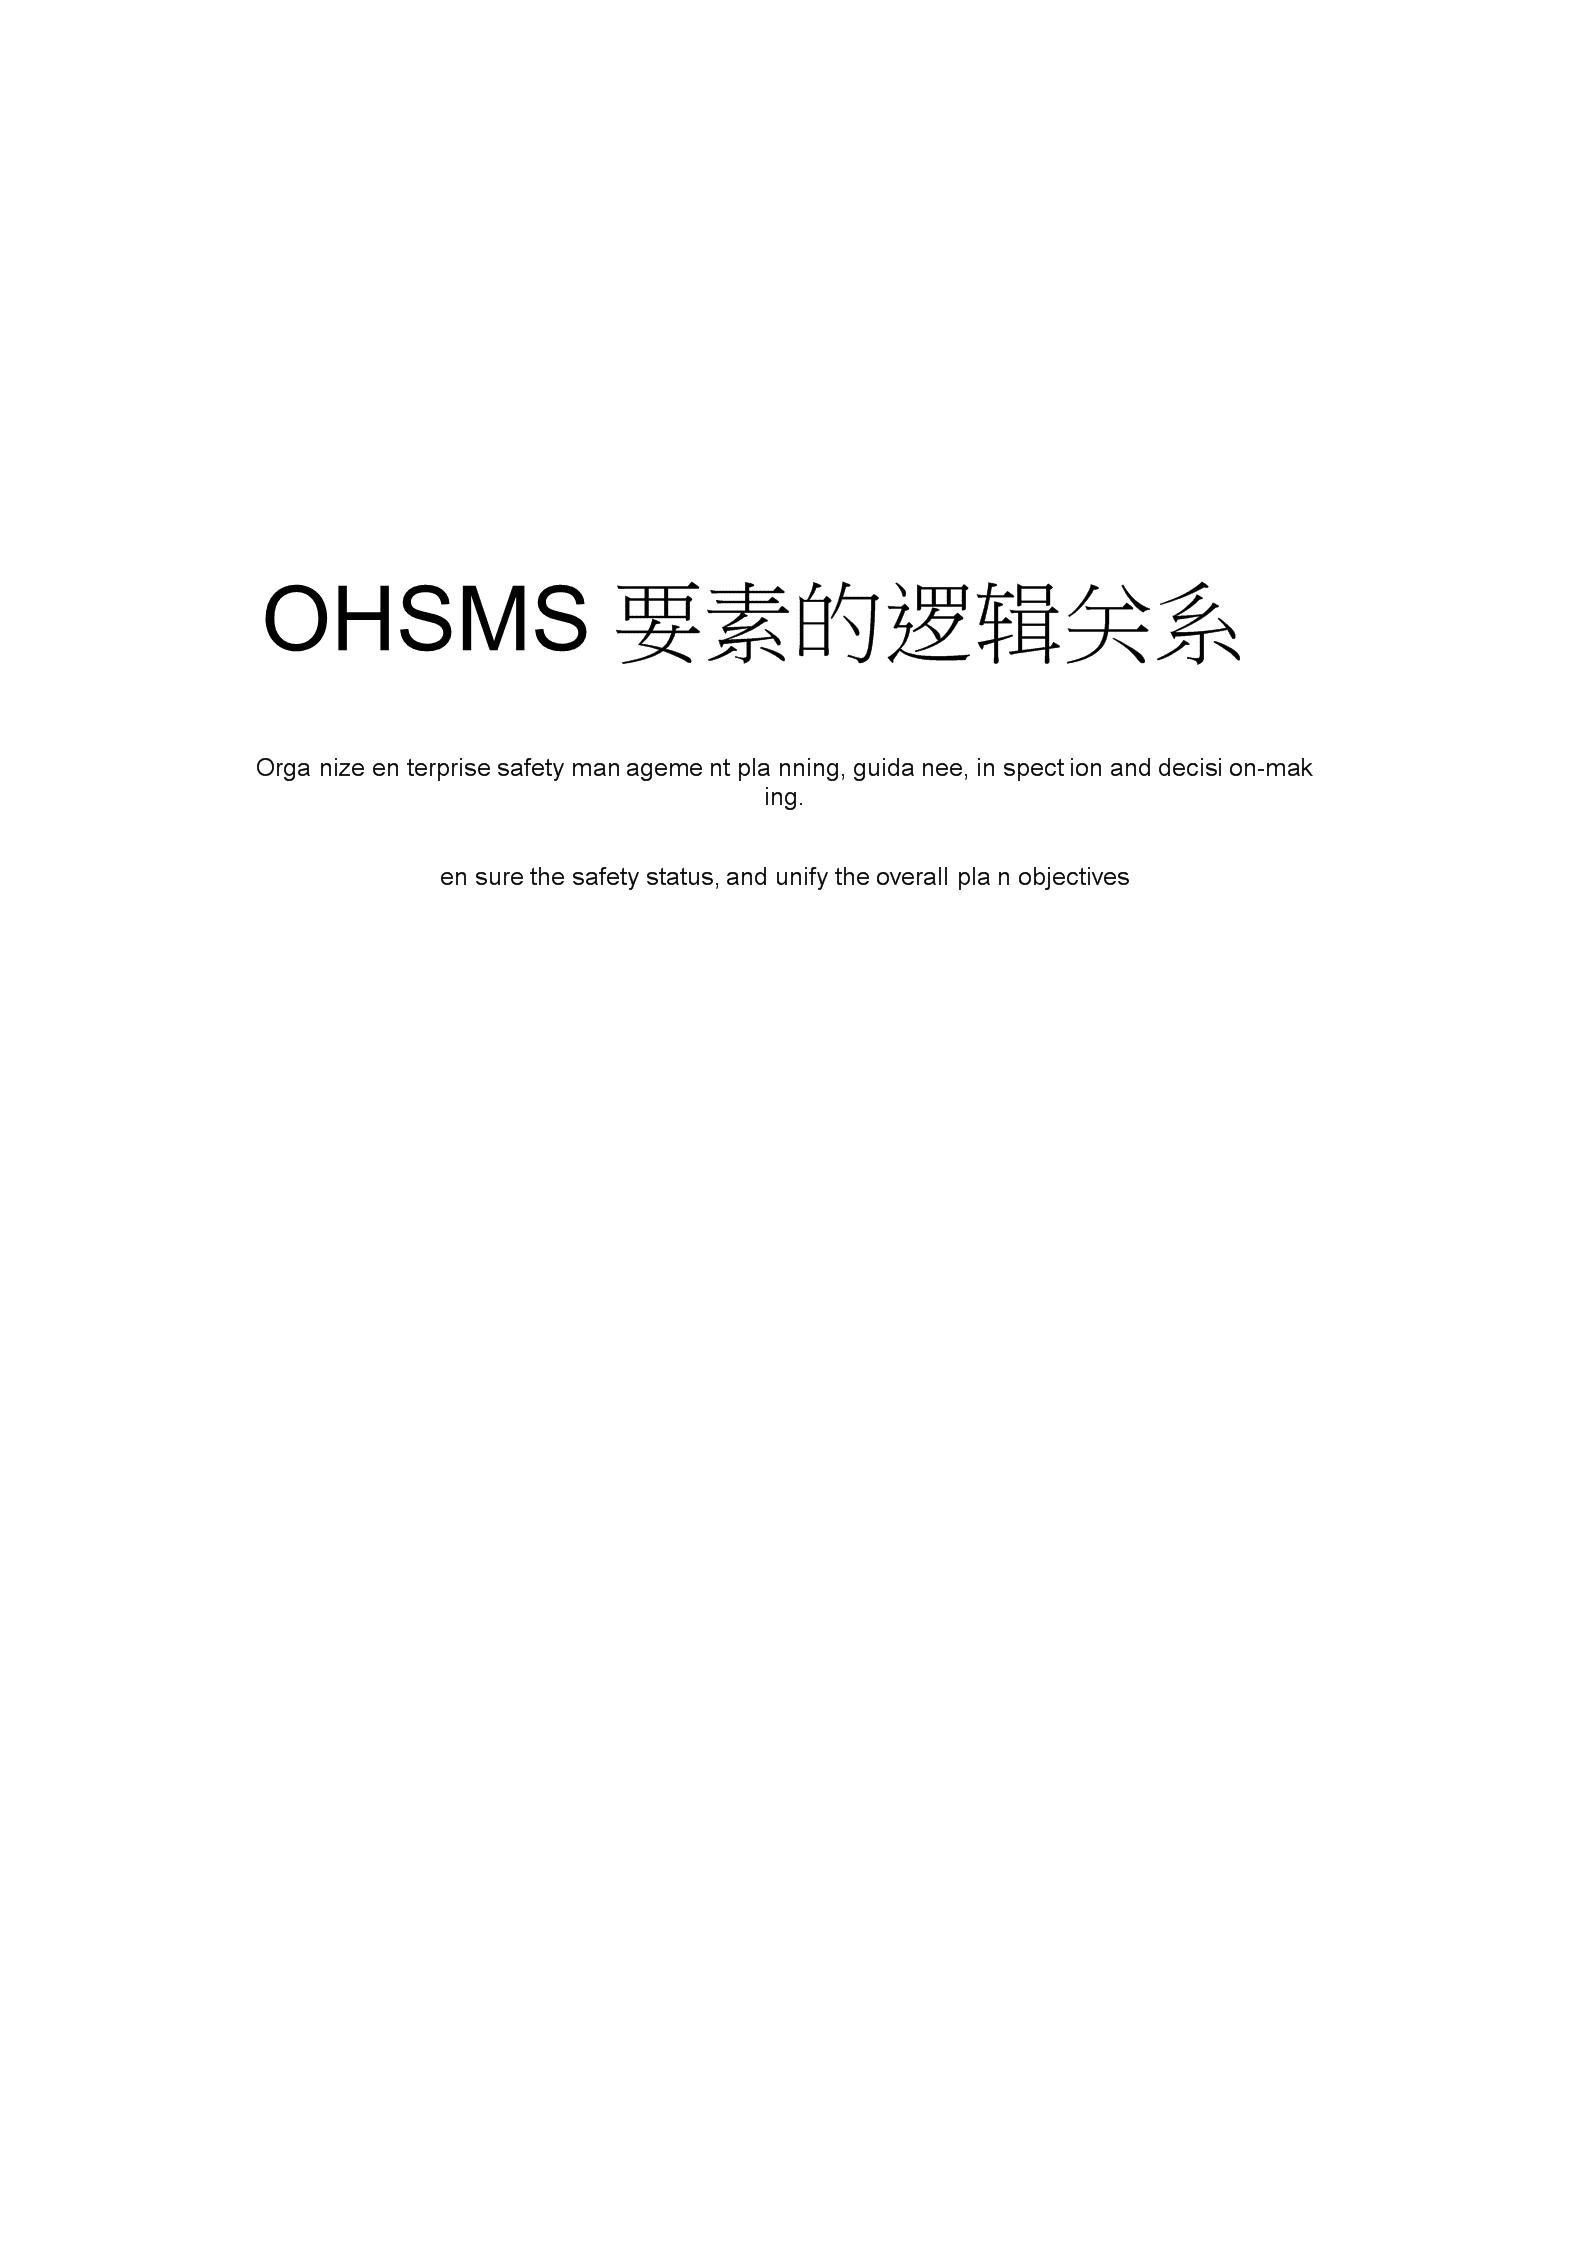 OHSMS要素的逻辑关系.docx